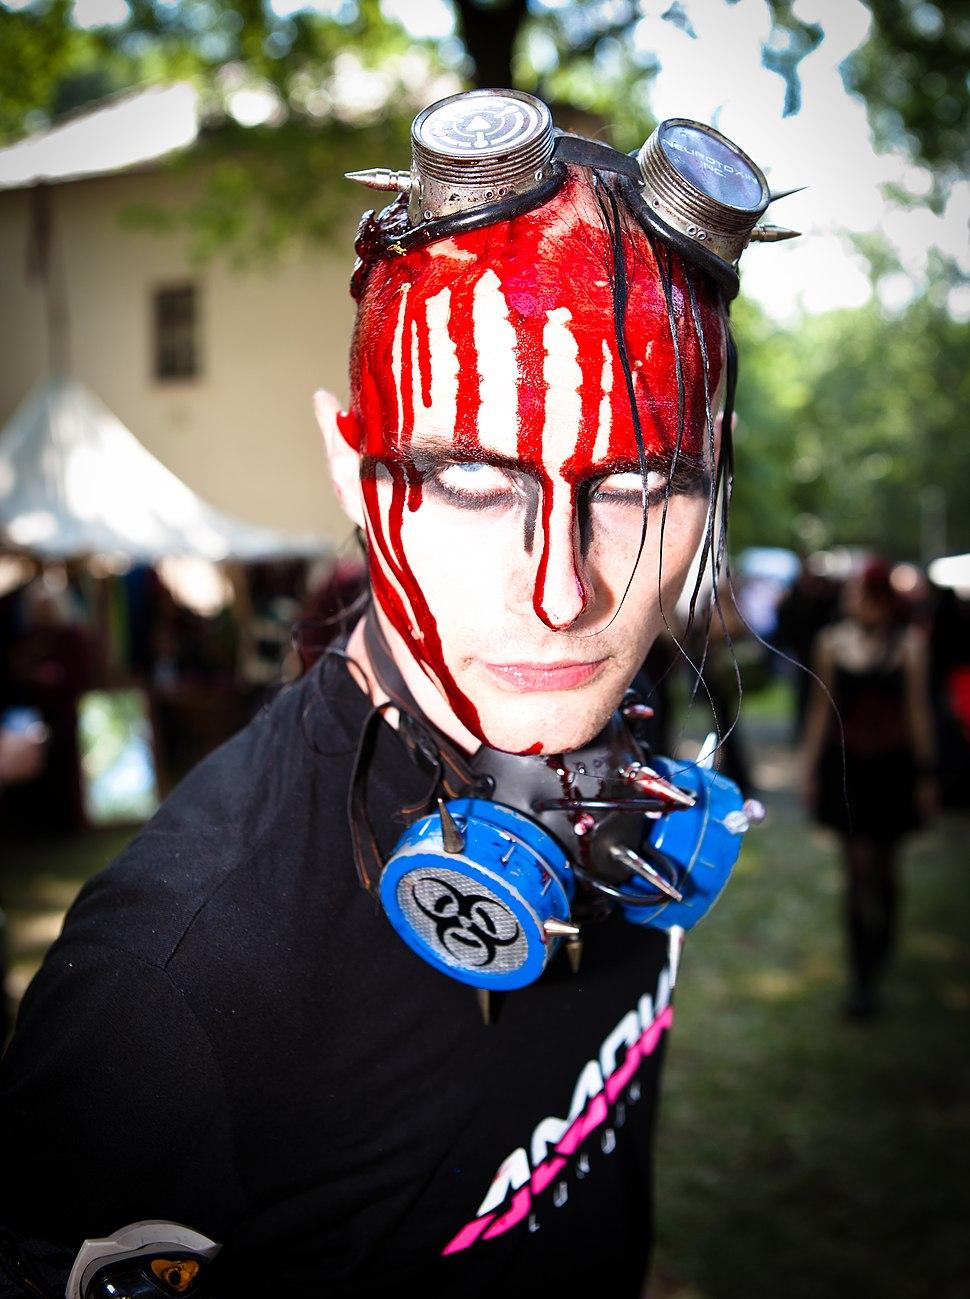 Blood Zombie ^ Cans - Flickr - SoulStealer.co.uk